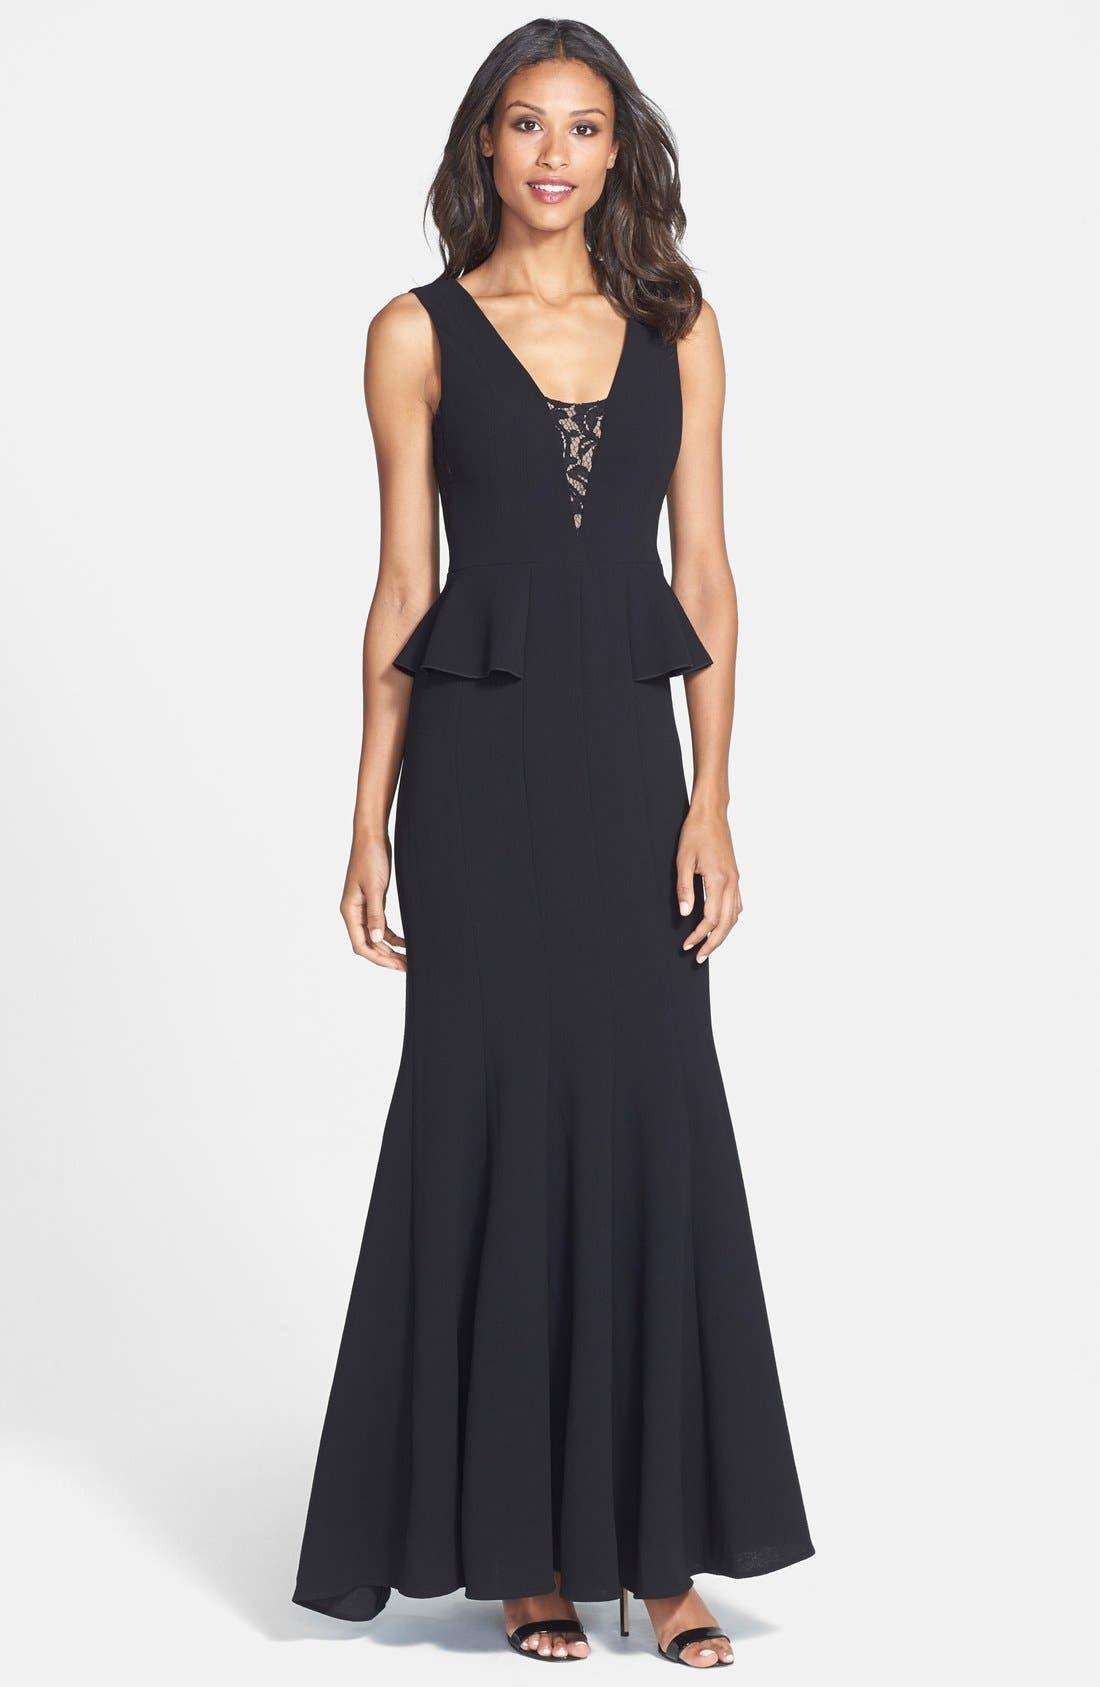 Main Image - BCBGMAXAZRIA 'Silva' Lace Inset Crepe Peplum Gown